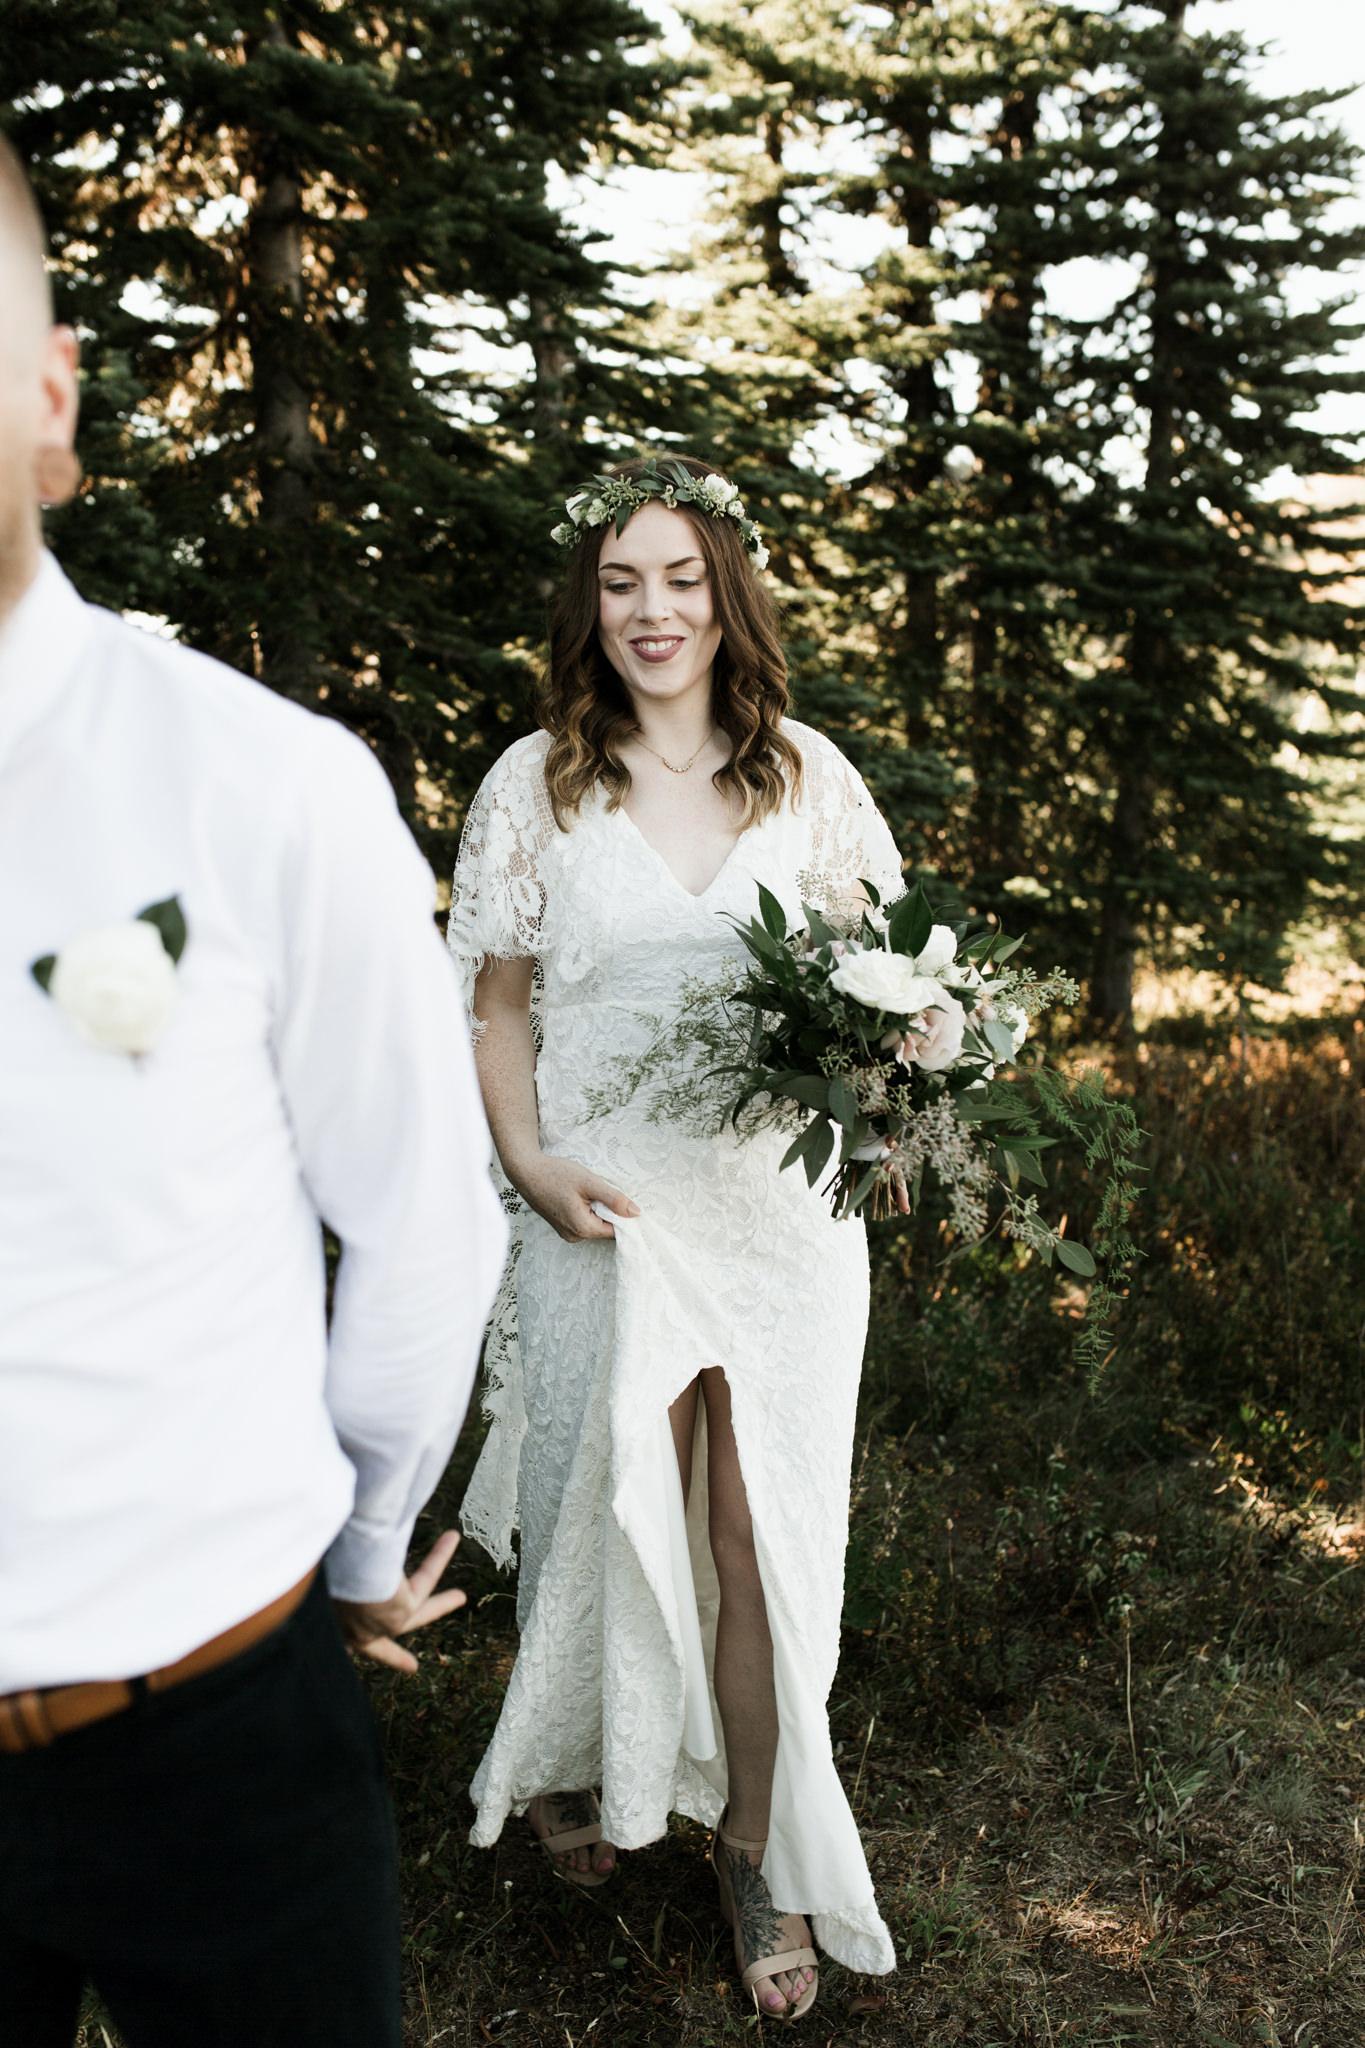 Jesse-Kasie-Hurricane-Ridge-Wedding-3.jpg